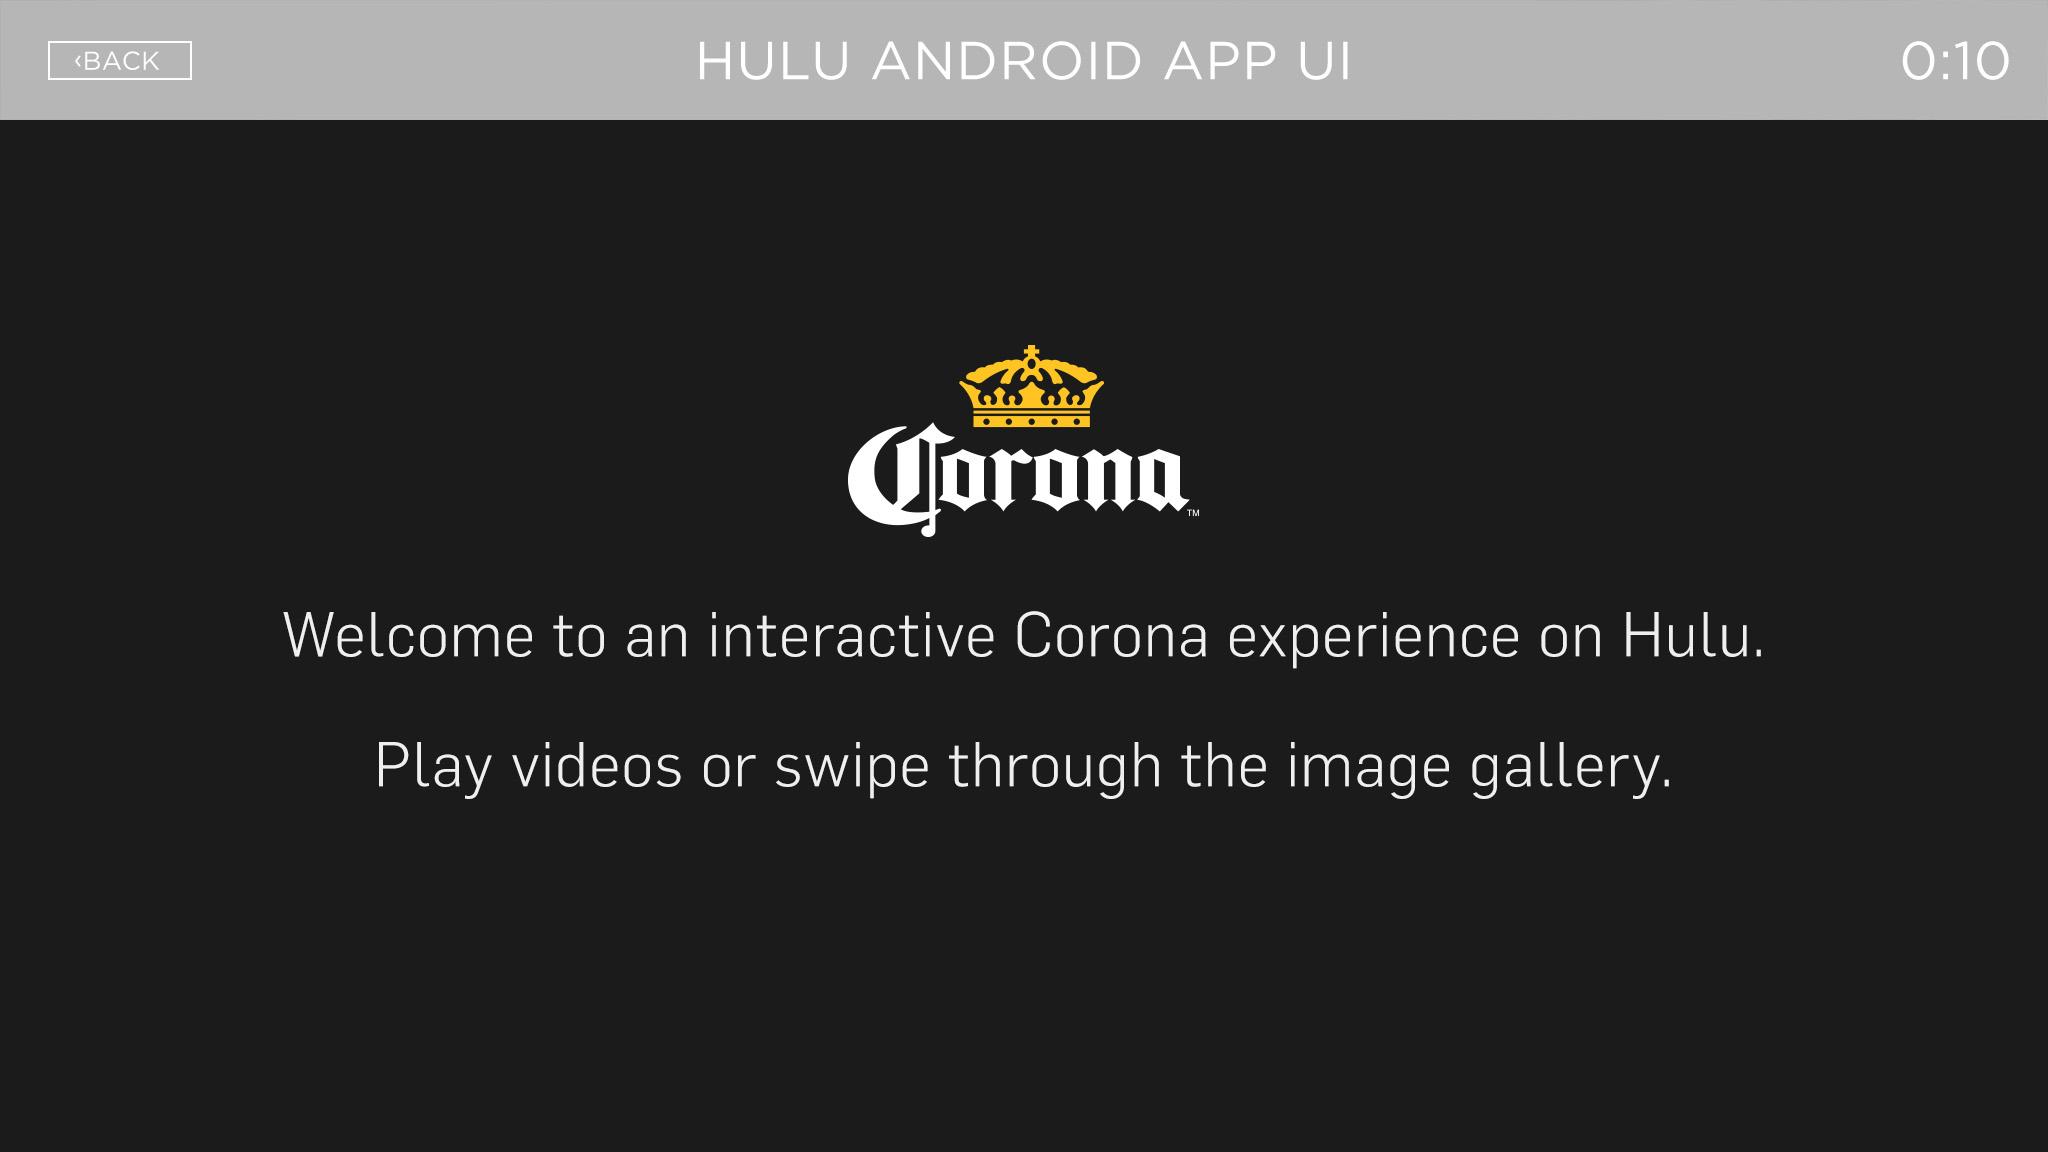 corona-extra-mobile-interactive-2048x1152_v7_Page_1.jpg